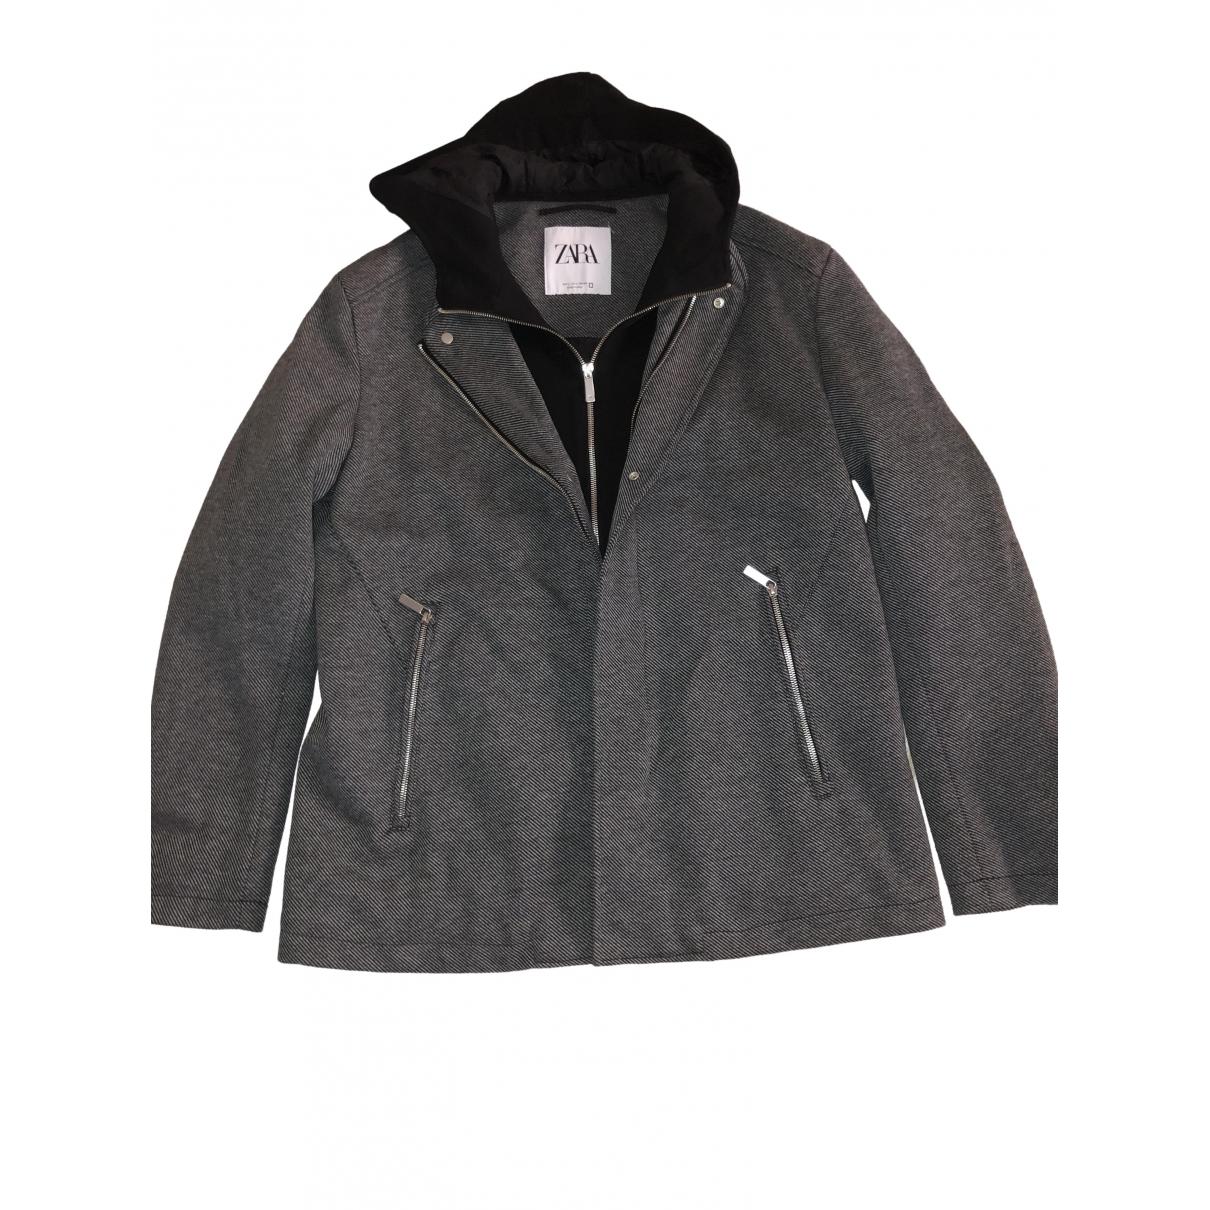 Zara \N Anthracite jacket  for Men L International